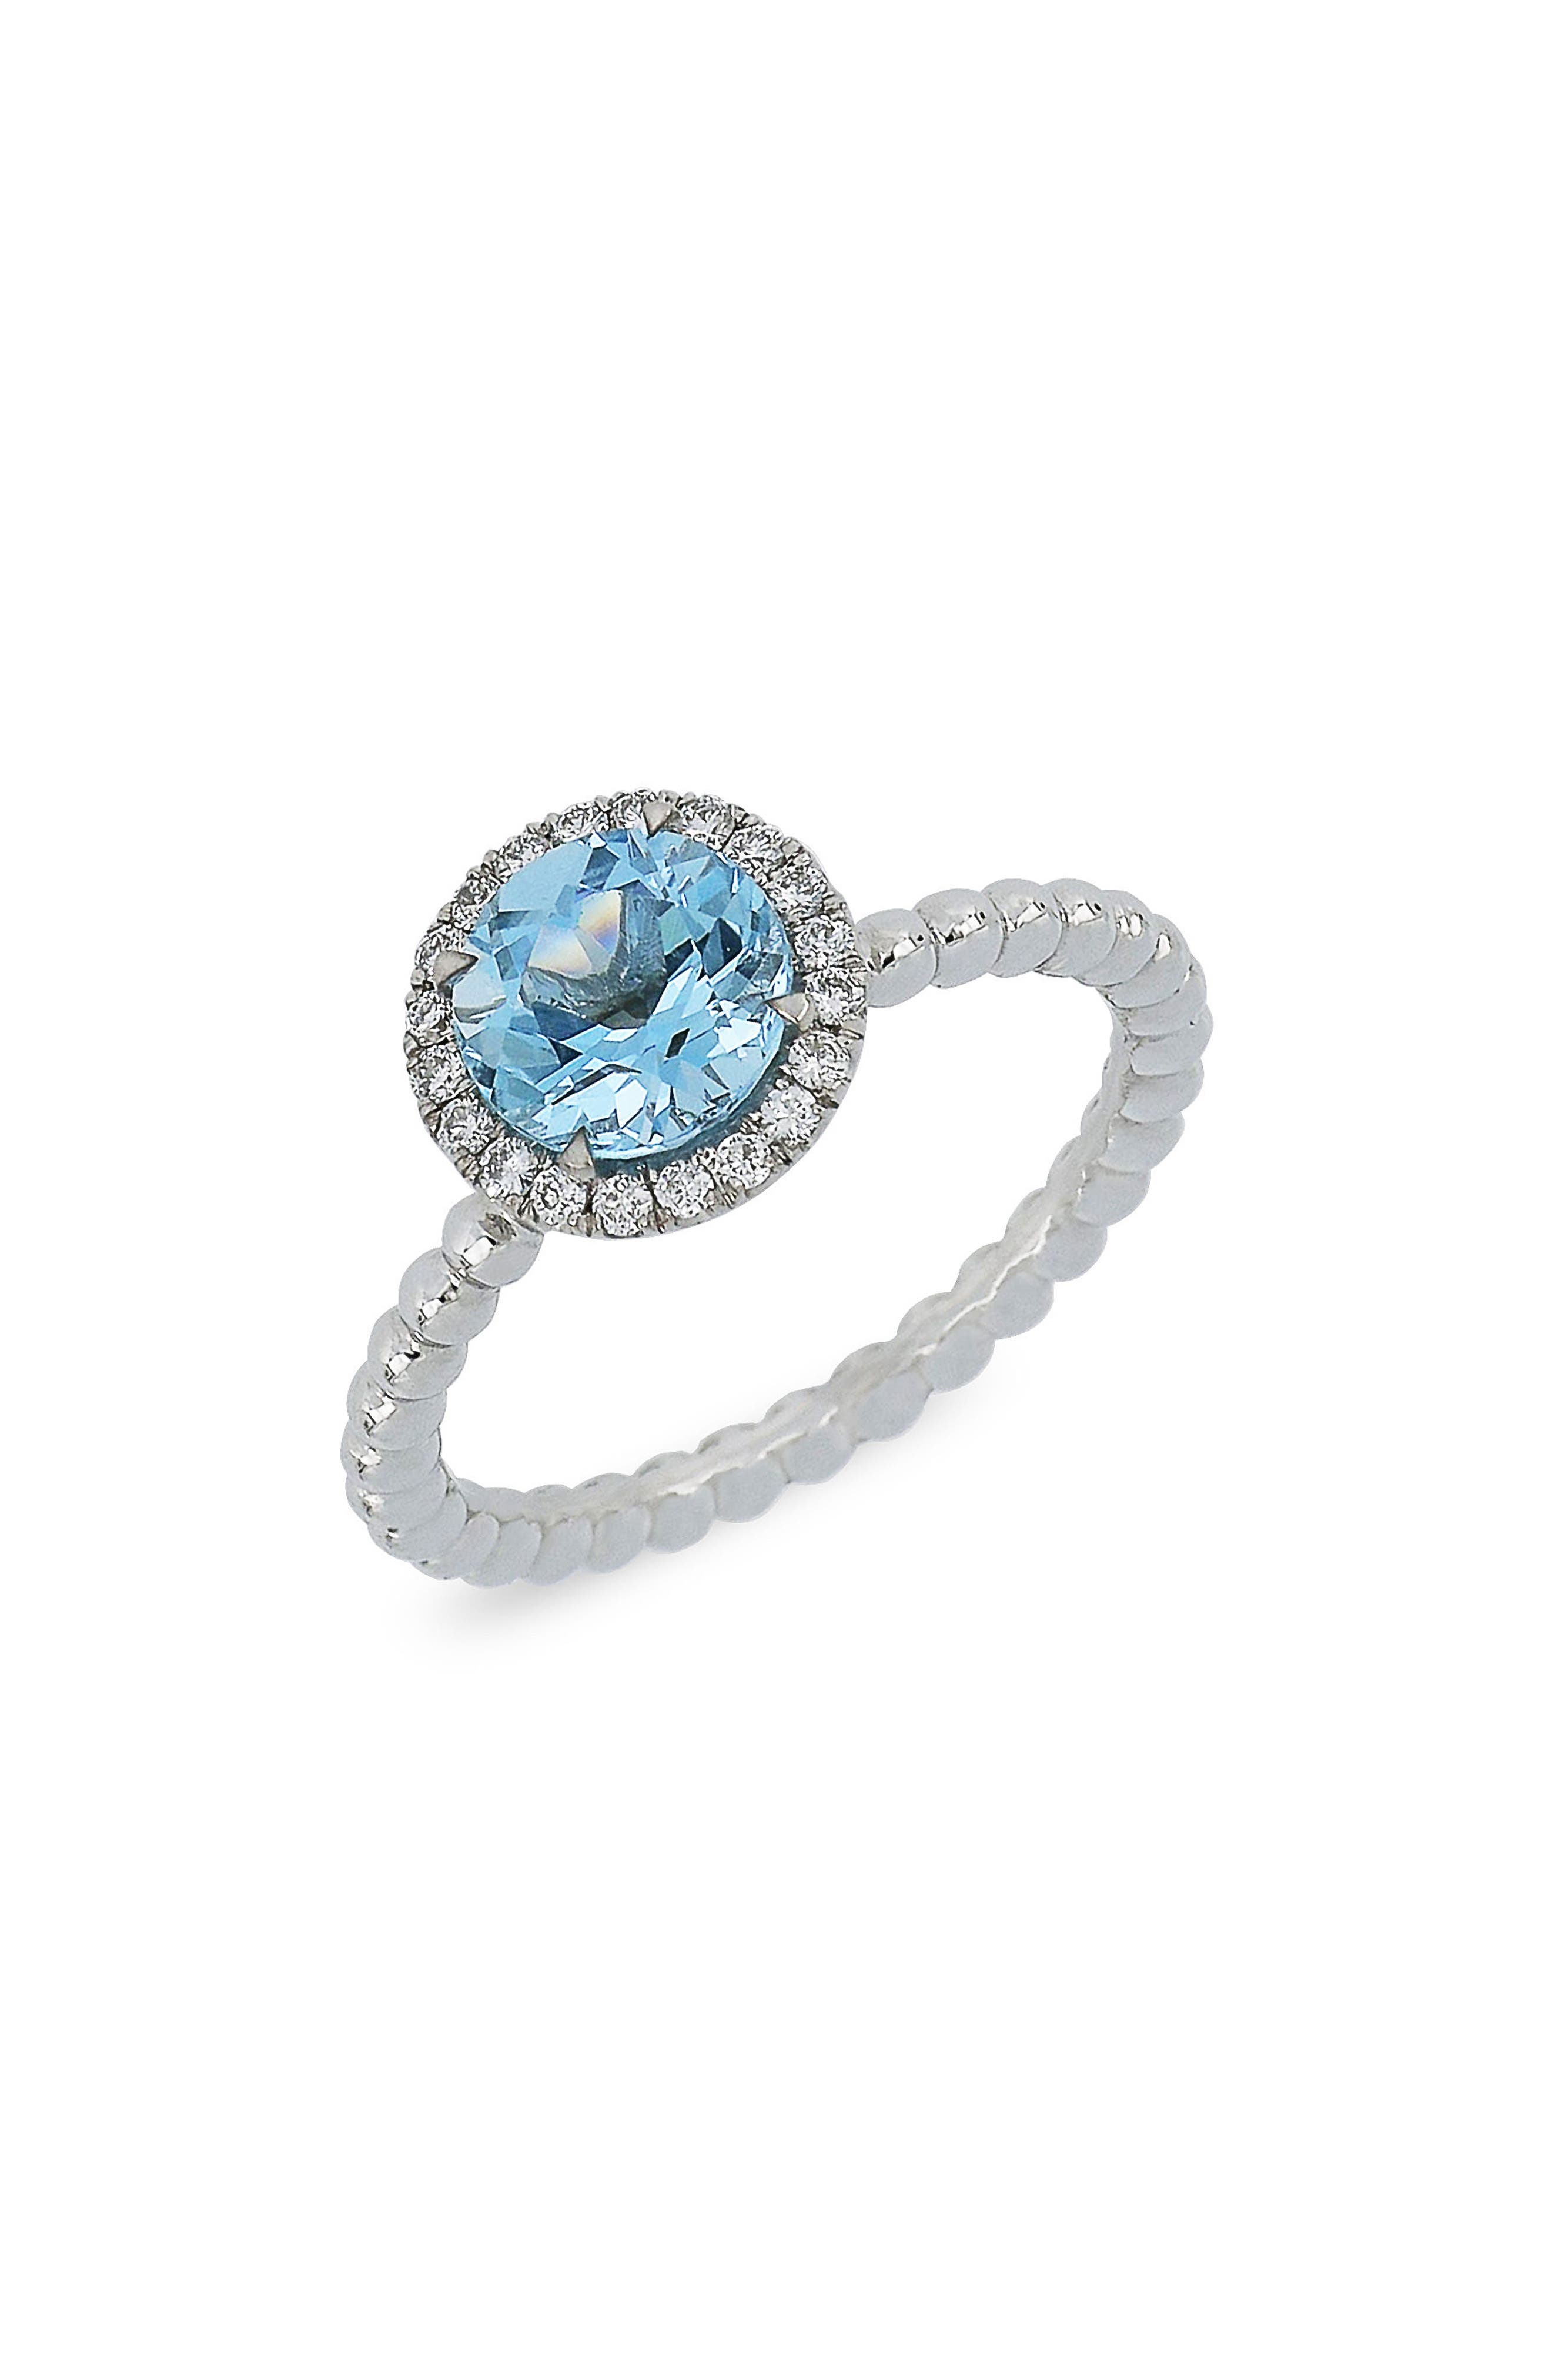 Main Image - Bony Levy Round Aquamarine & Diamond Ring (Nordstrom Exclusive)